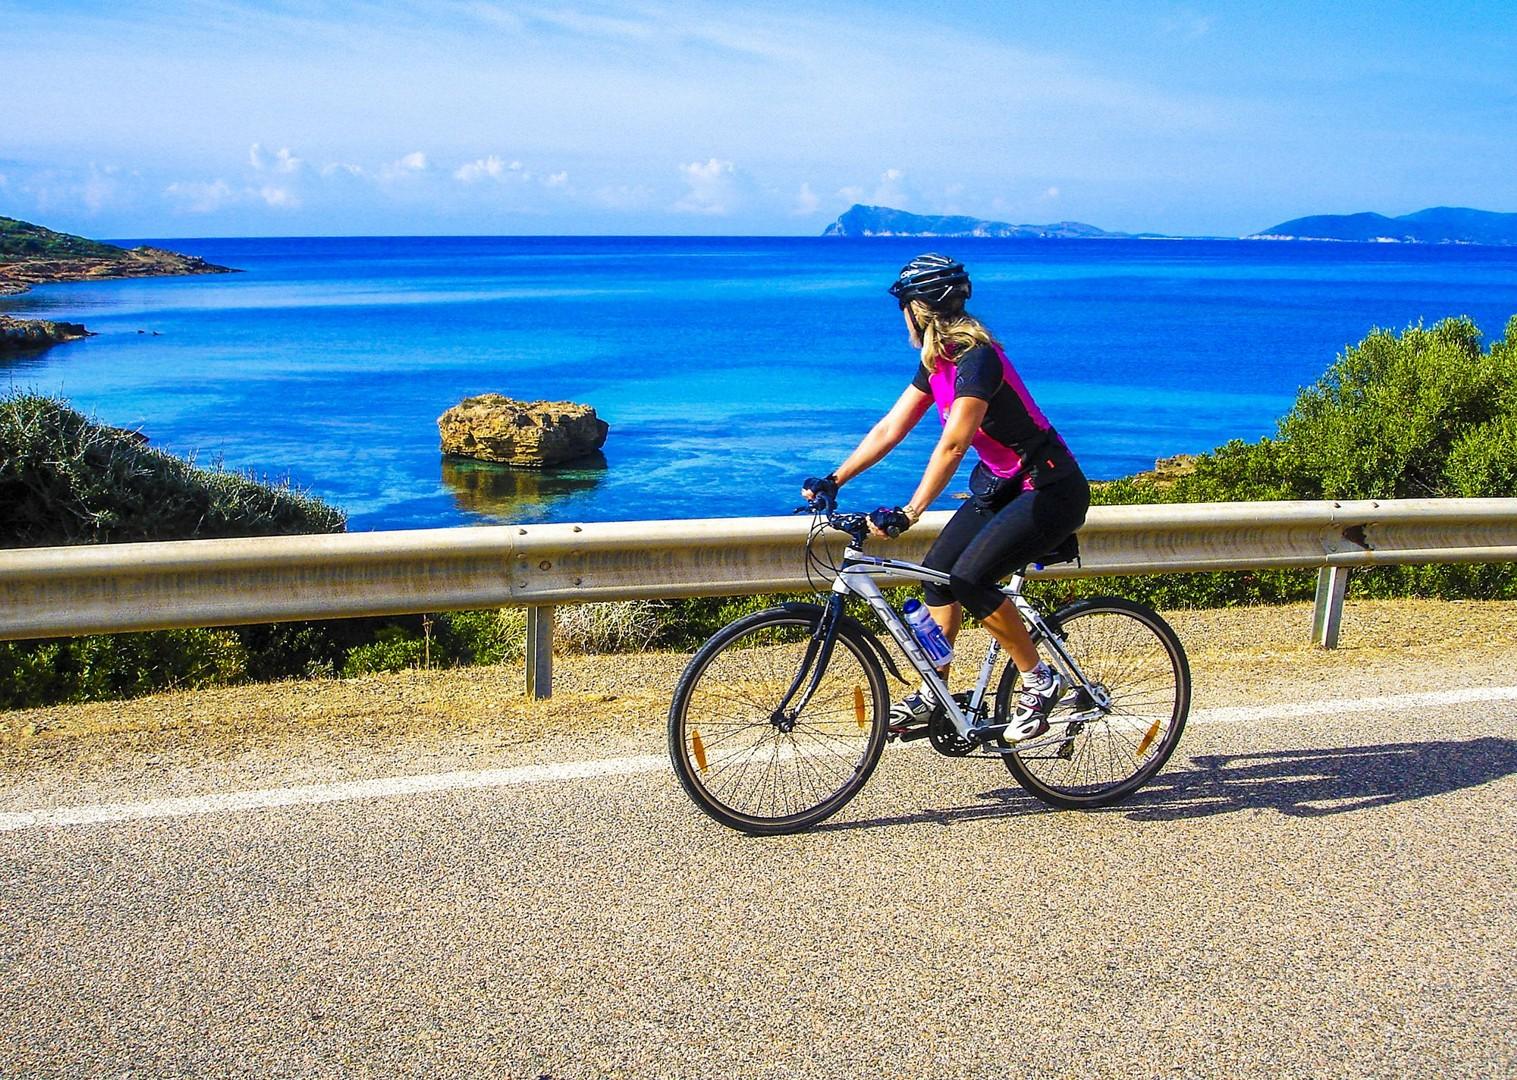 saddle-skedaddle-leisure-cycling-self-guided-sardinia.jpg - Italy - Sardinia - Island Flavours - Self-Guided Leisure Cycling Holiday - Italia Leisure and Family Cycling